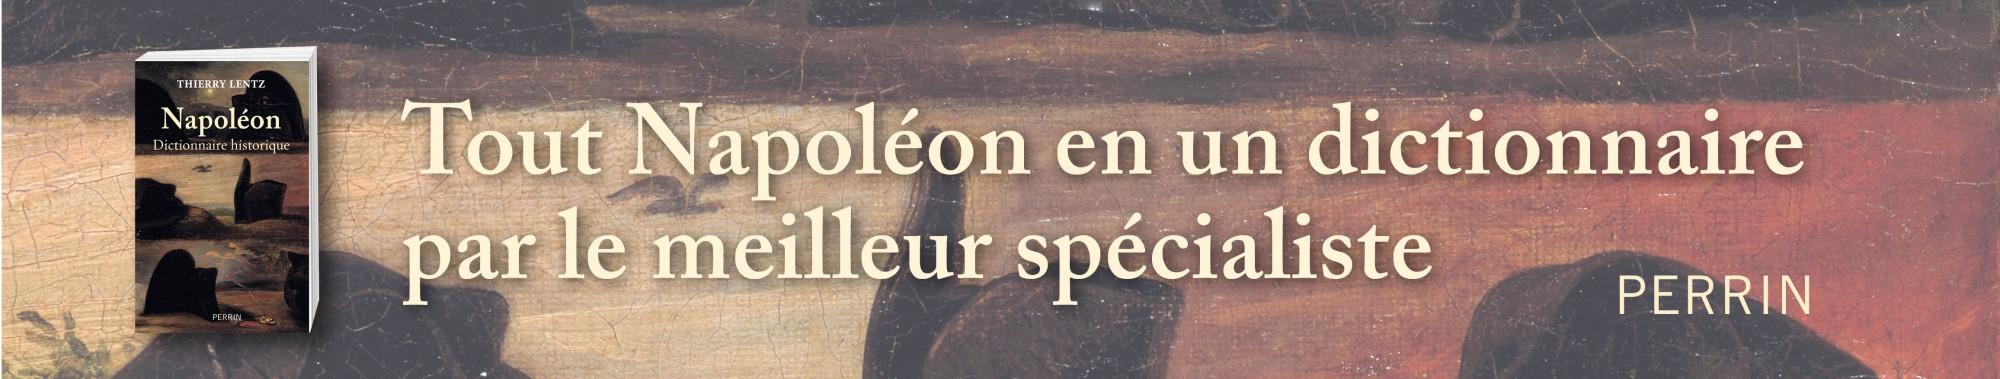 Napoleon dictionnaire historique -Perrin